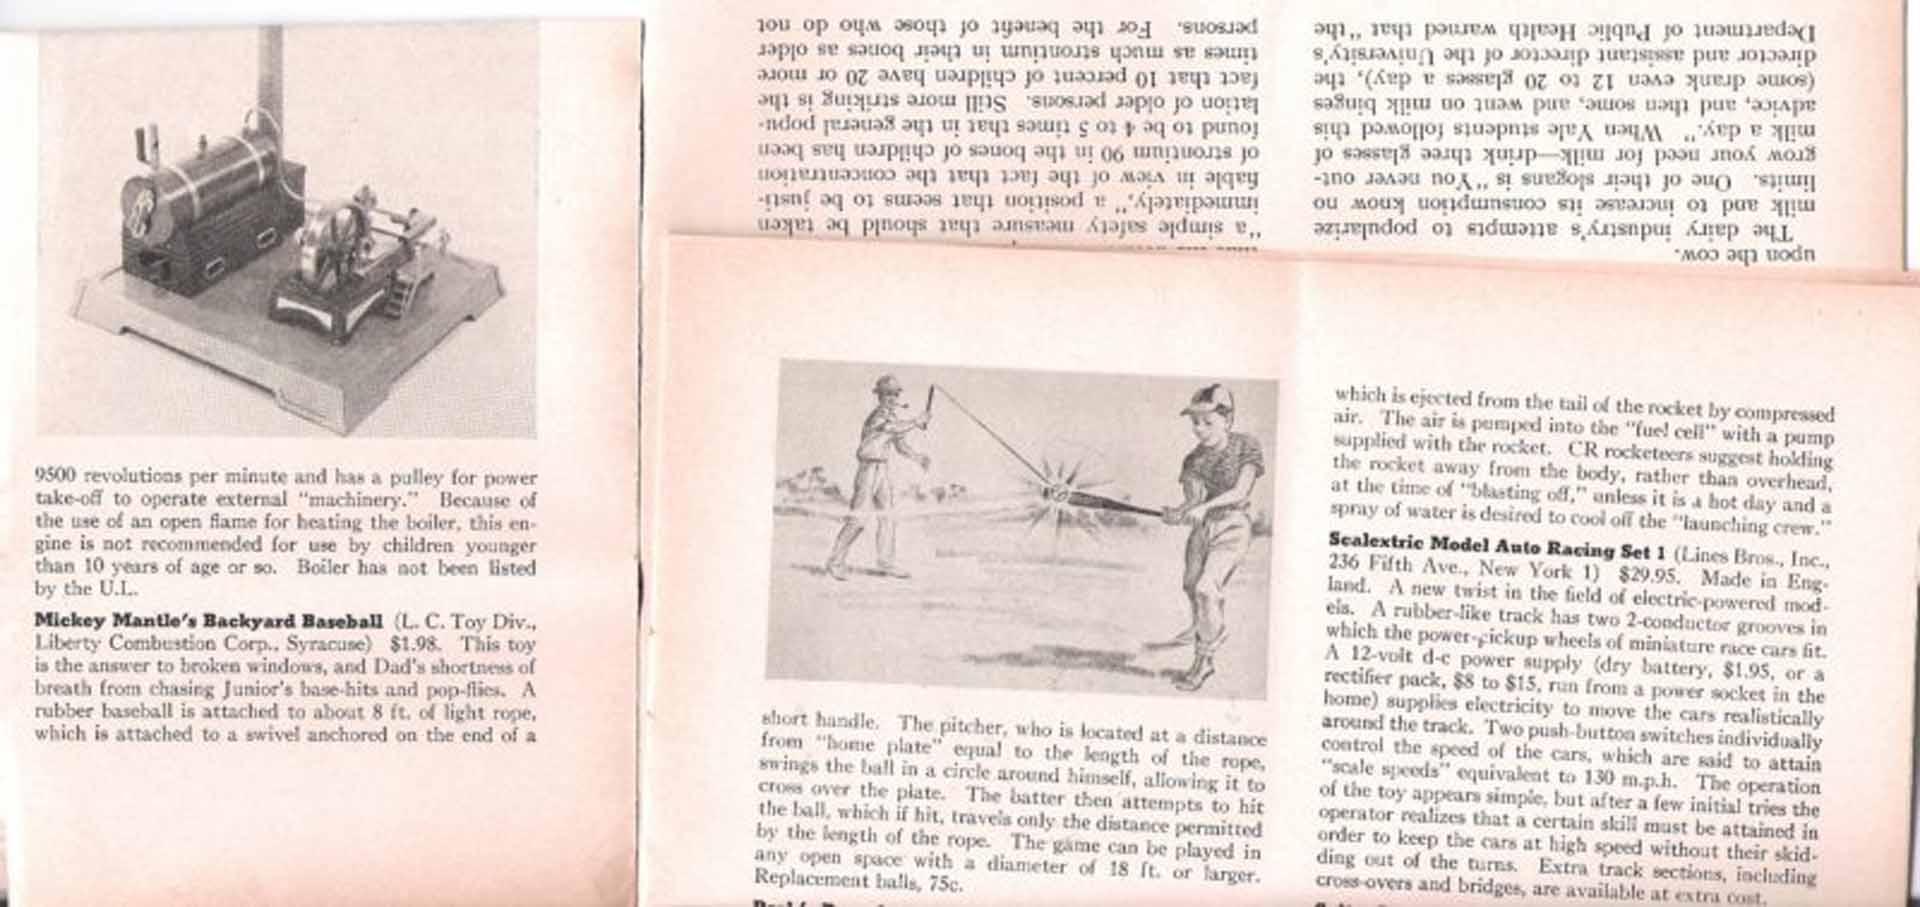 1959 consumer bulletin november